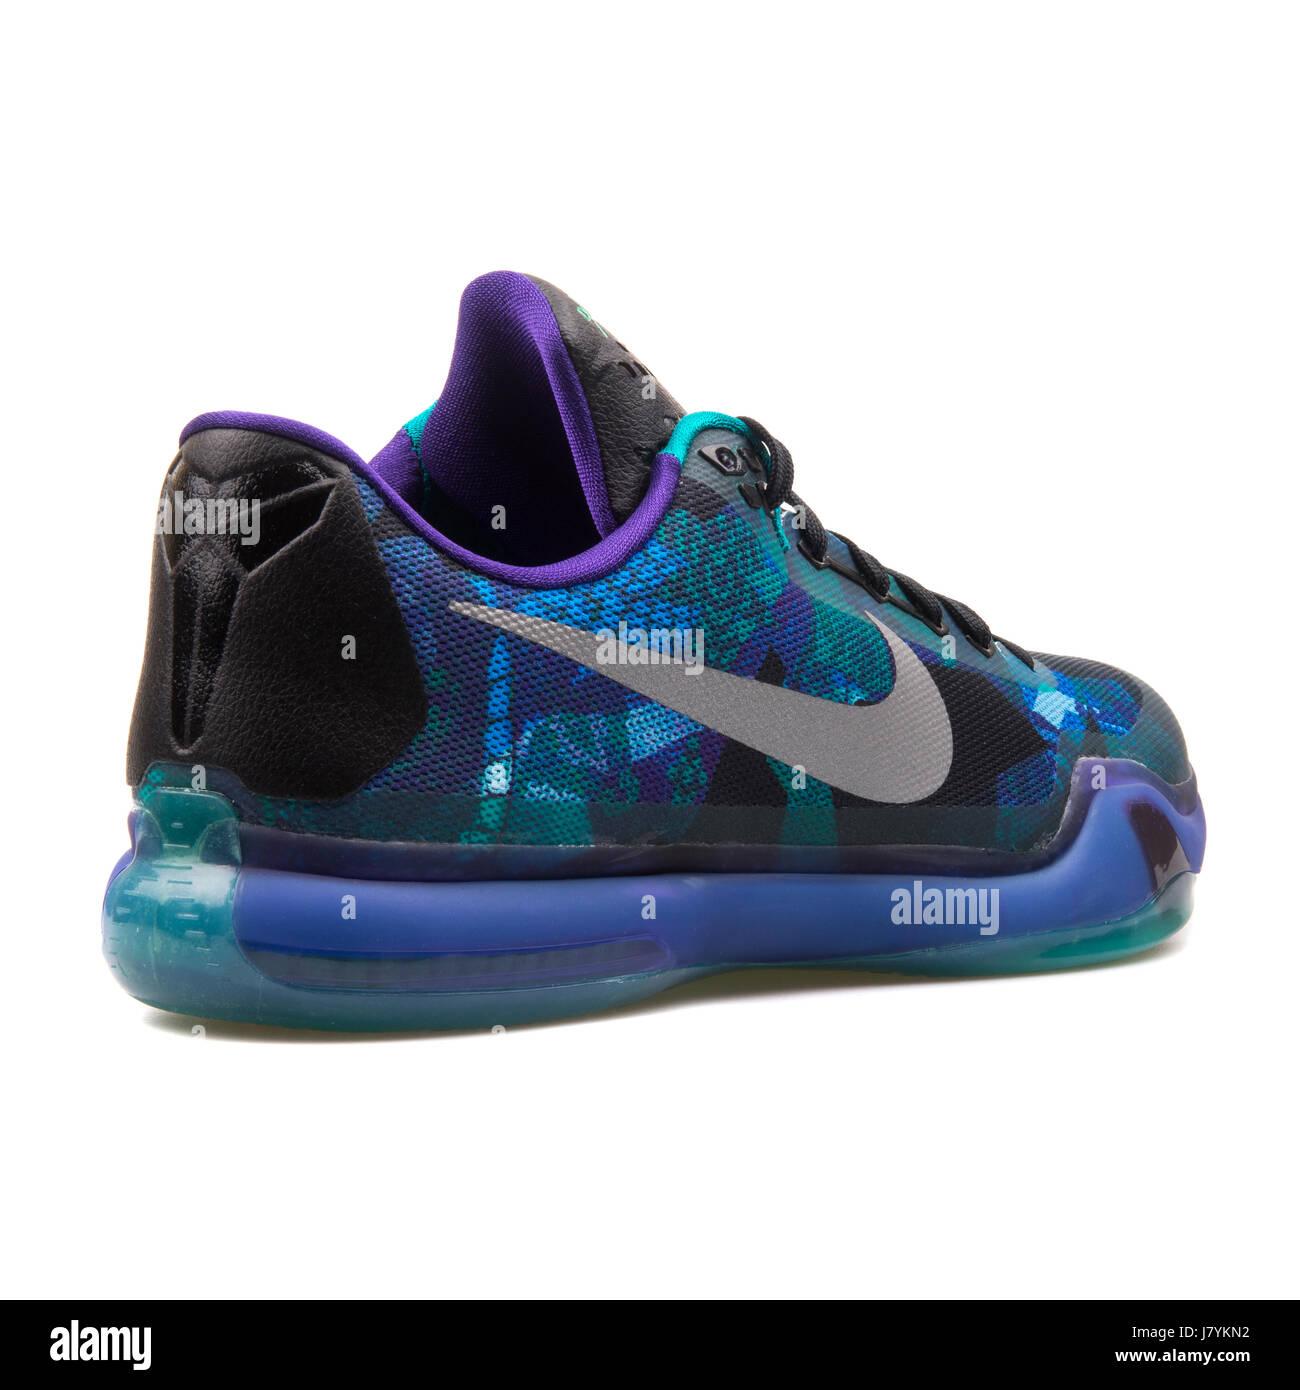 Nike Kobe X Blue Men's Basketball Sneakers - 705317-305 Stock ...